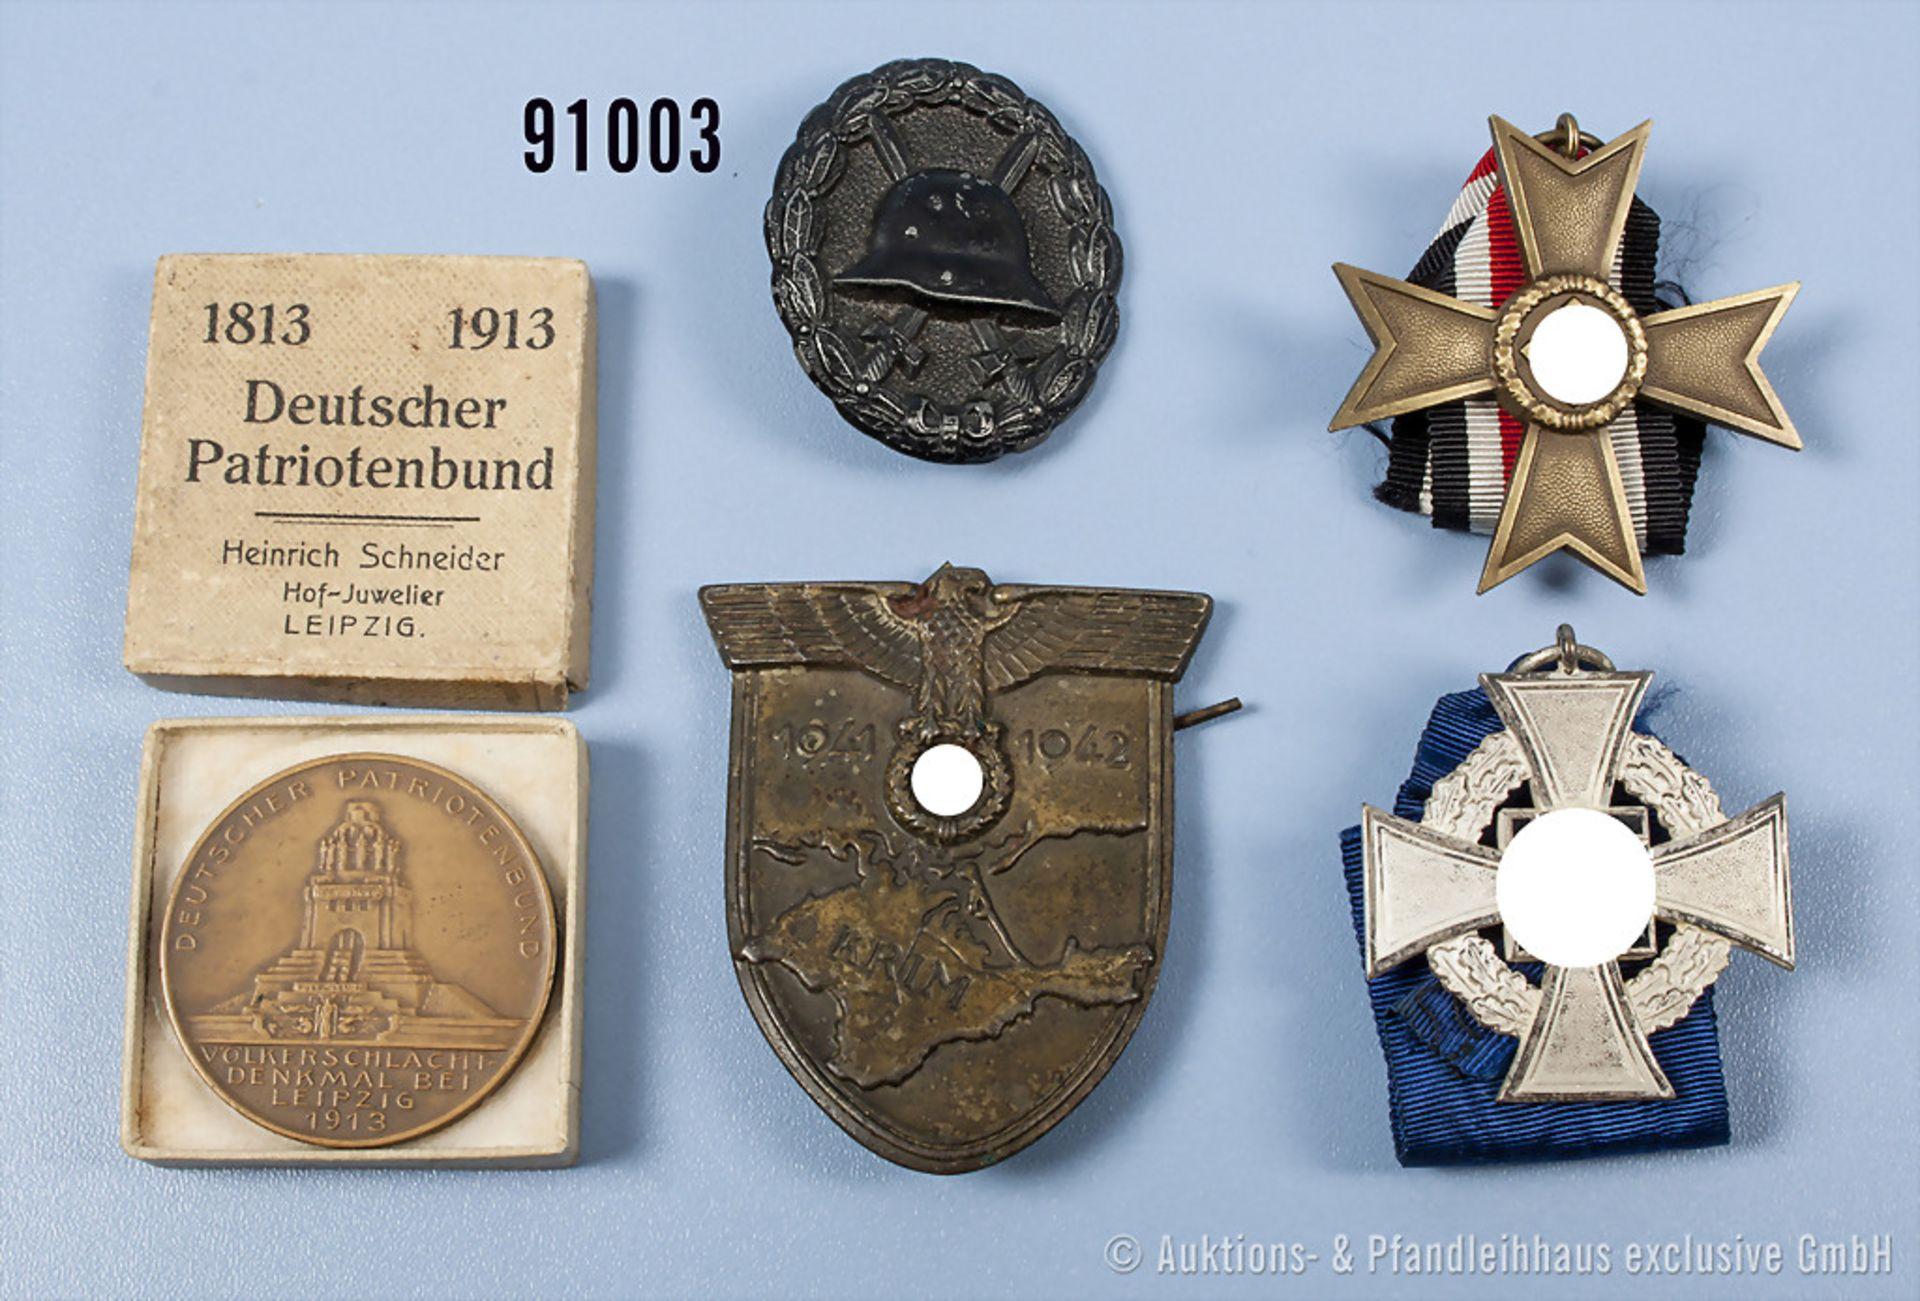 Konv. Krimschild, Eisenausf., rückseitig 4 Splinte, die Gegenplatte fehlt, KVK 2. Klasse ohne